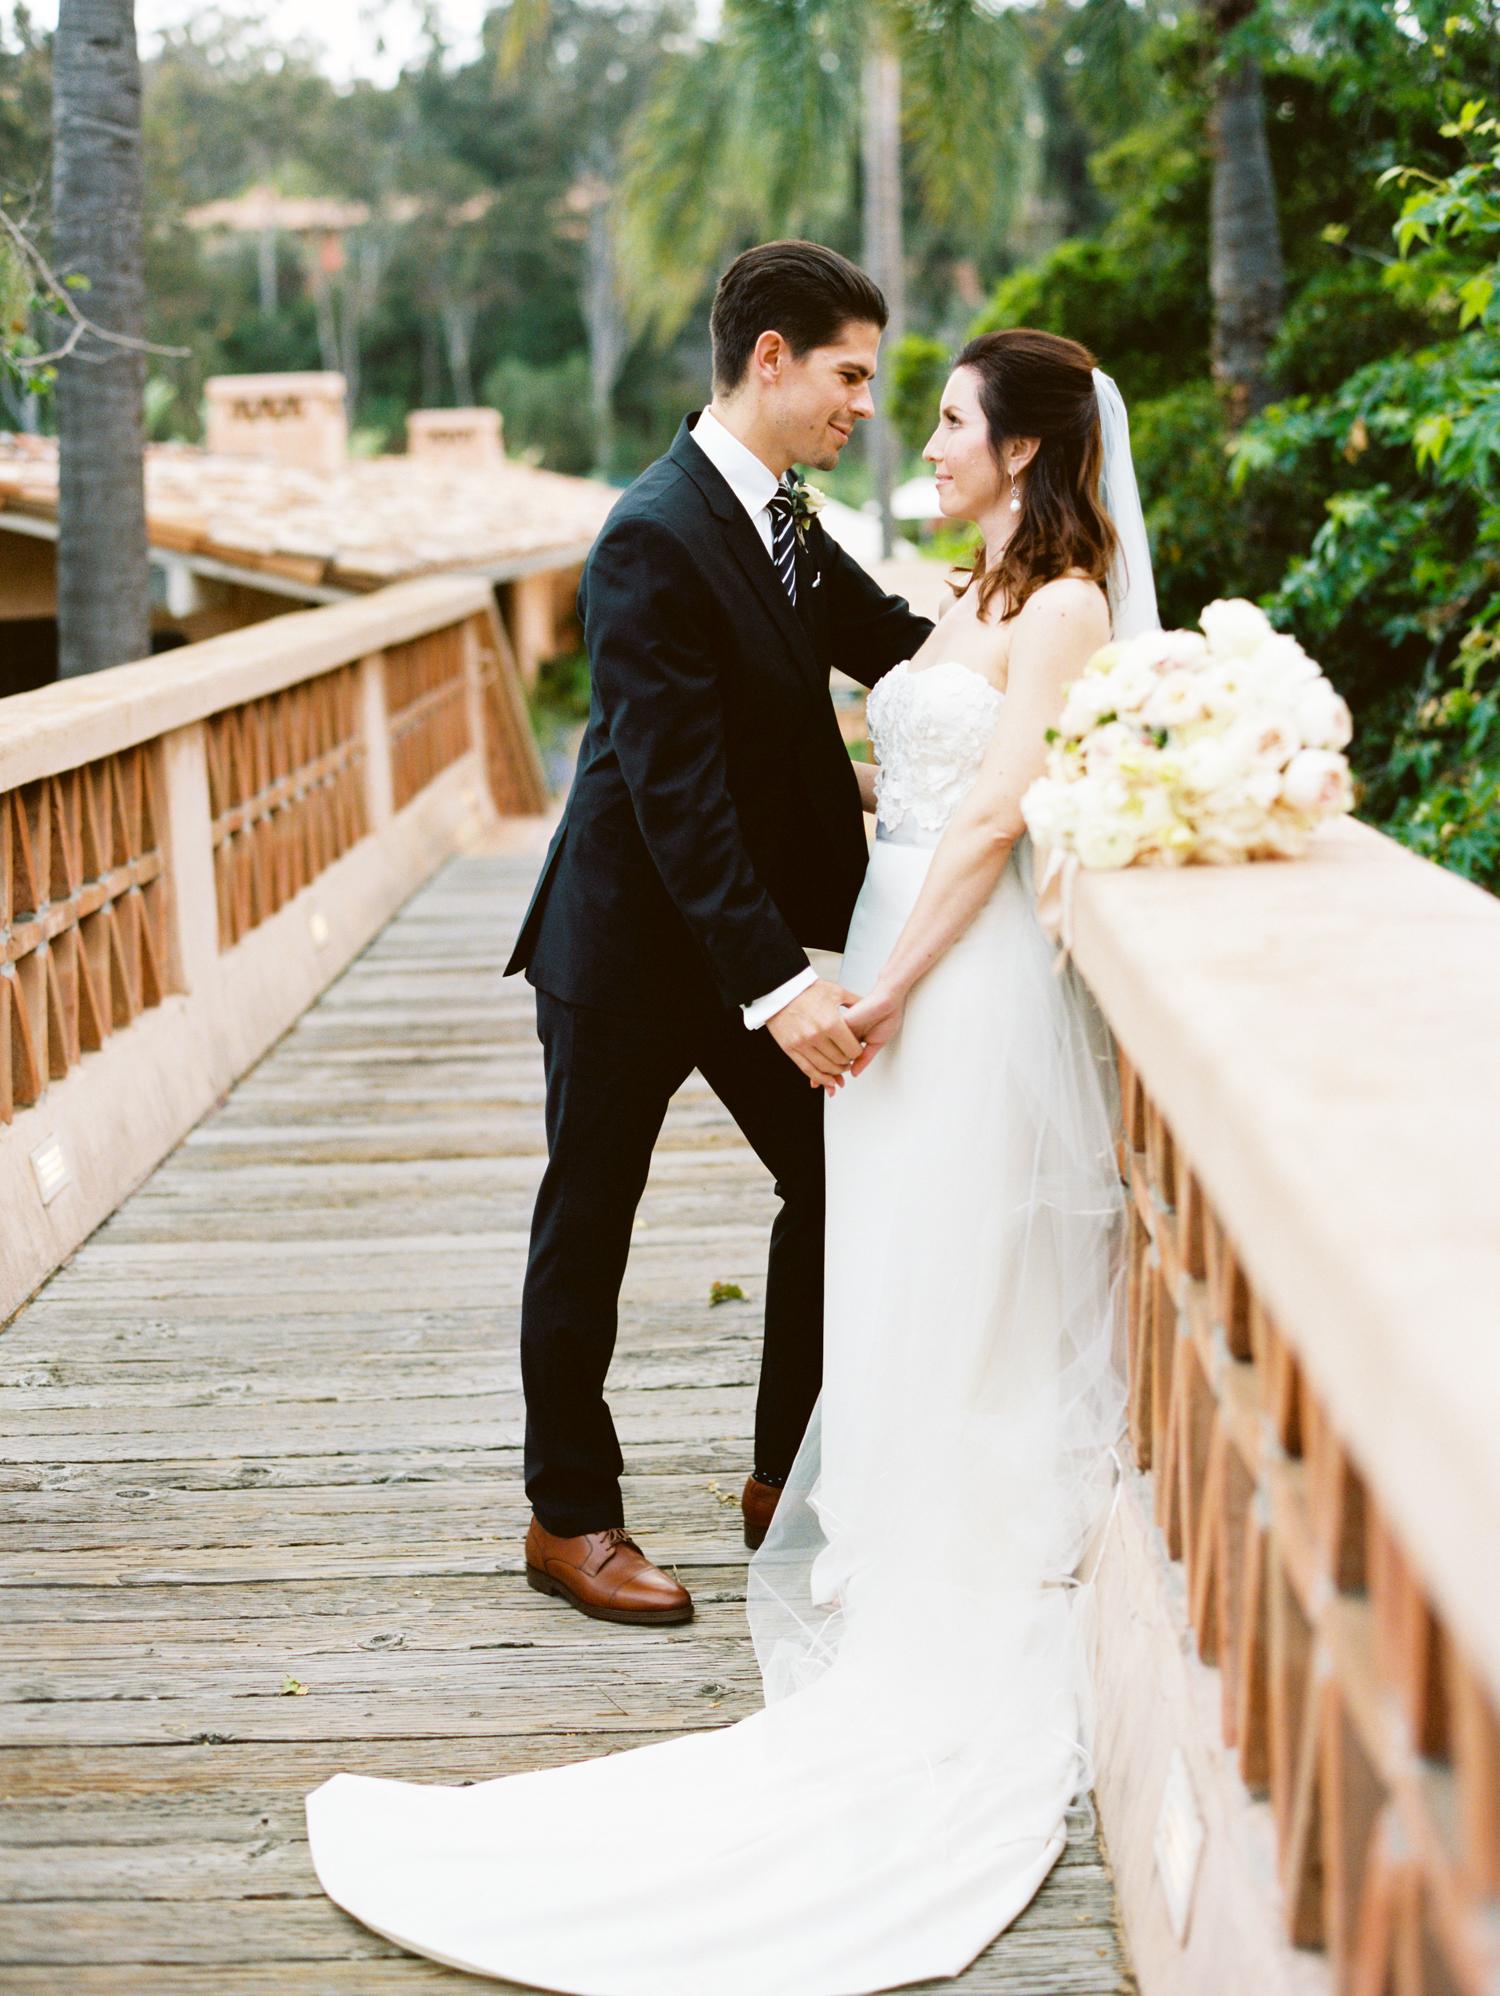 14 Private Estate Wedding Event Design by Joy Proctor.JPG